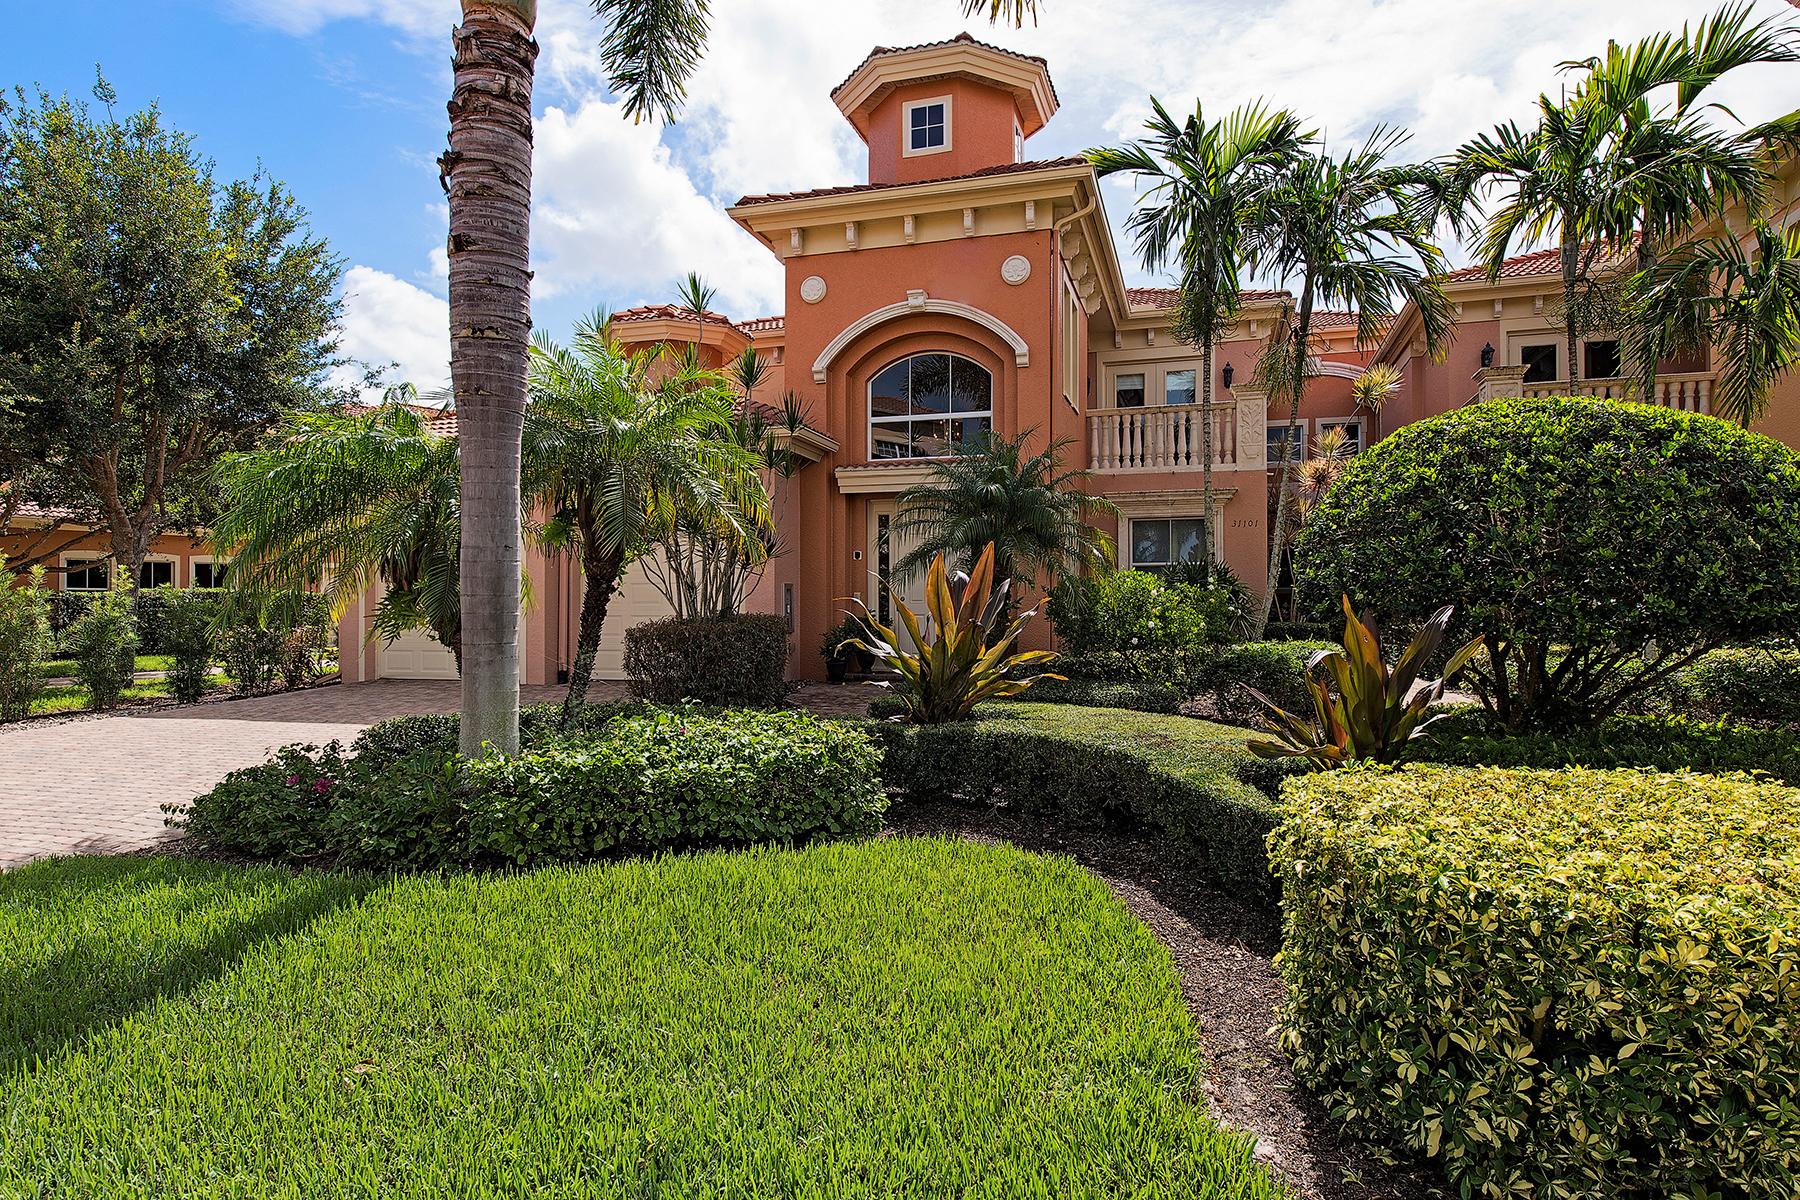 Condomínio para Venda às VINEYARDS - AVELLINO ISLES 537 Avellino Isles Cir 31201 Naples, Florida, 34119 Estados Unidos